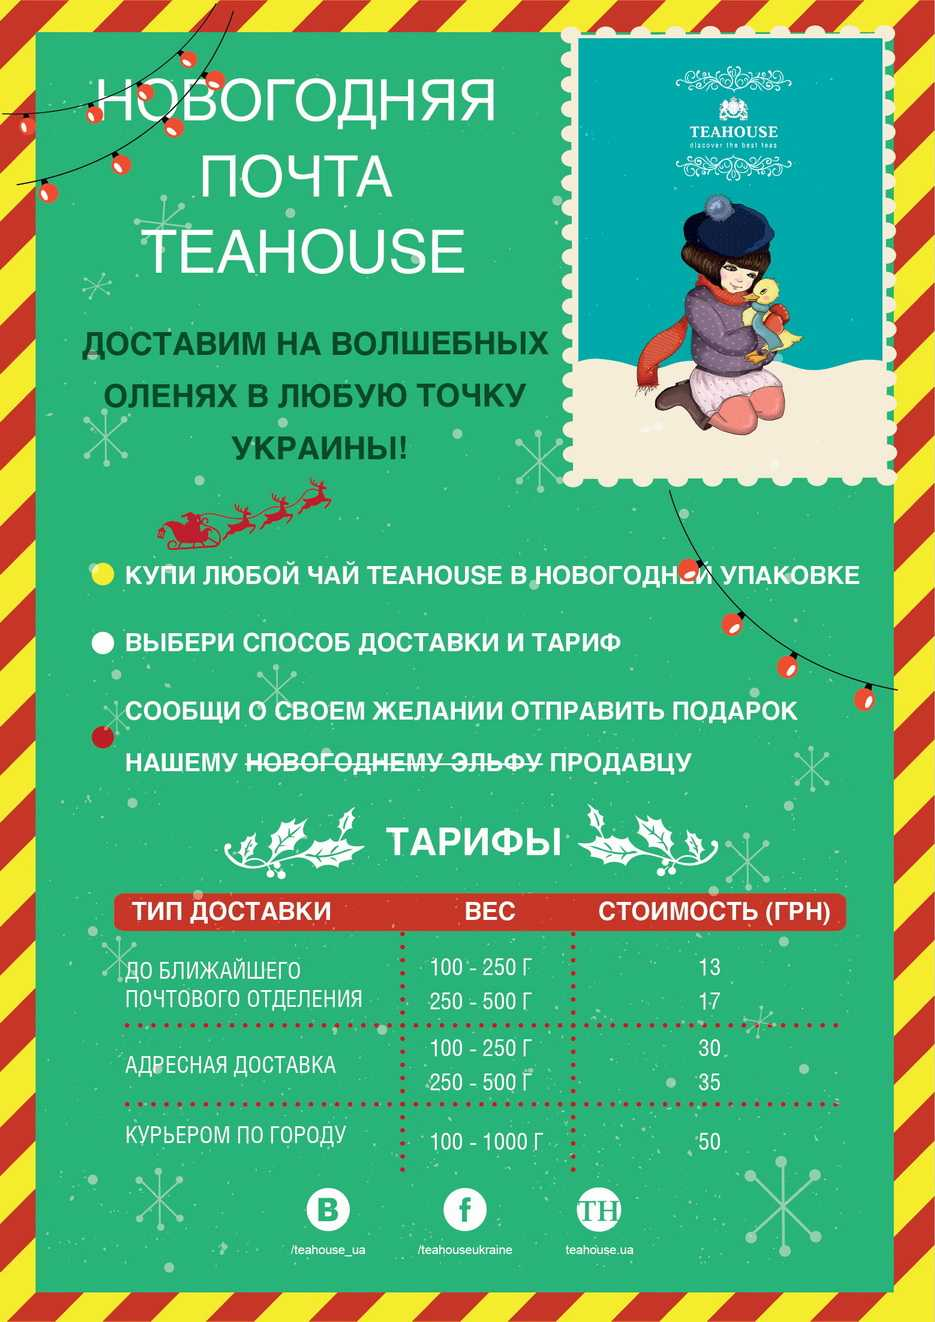 Новорічна пошта Teahouse!